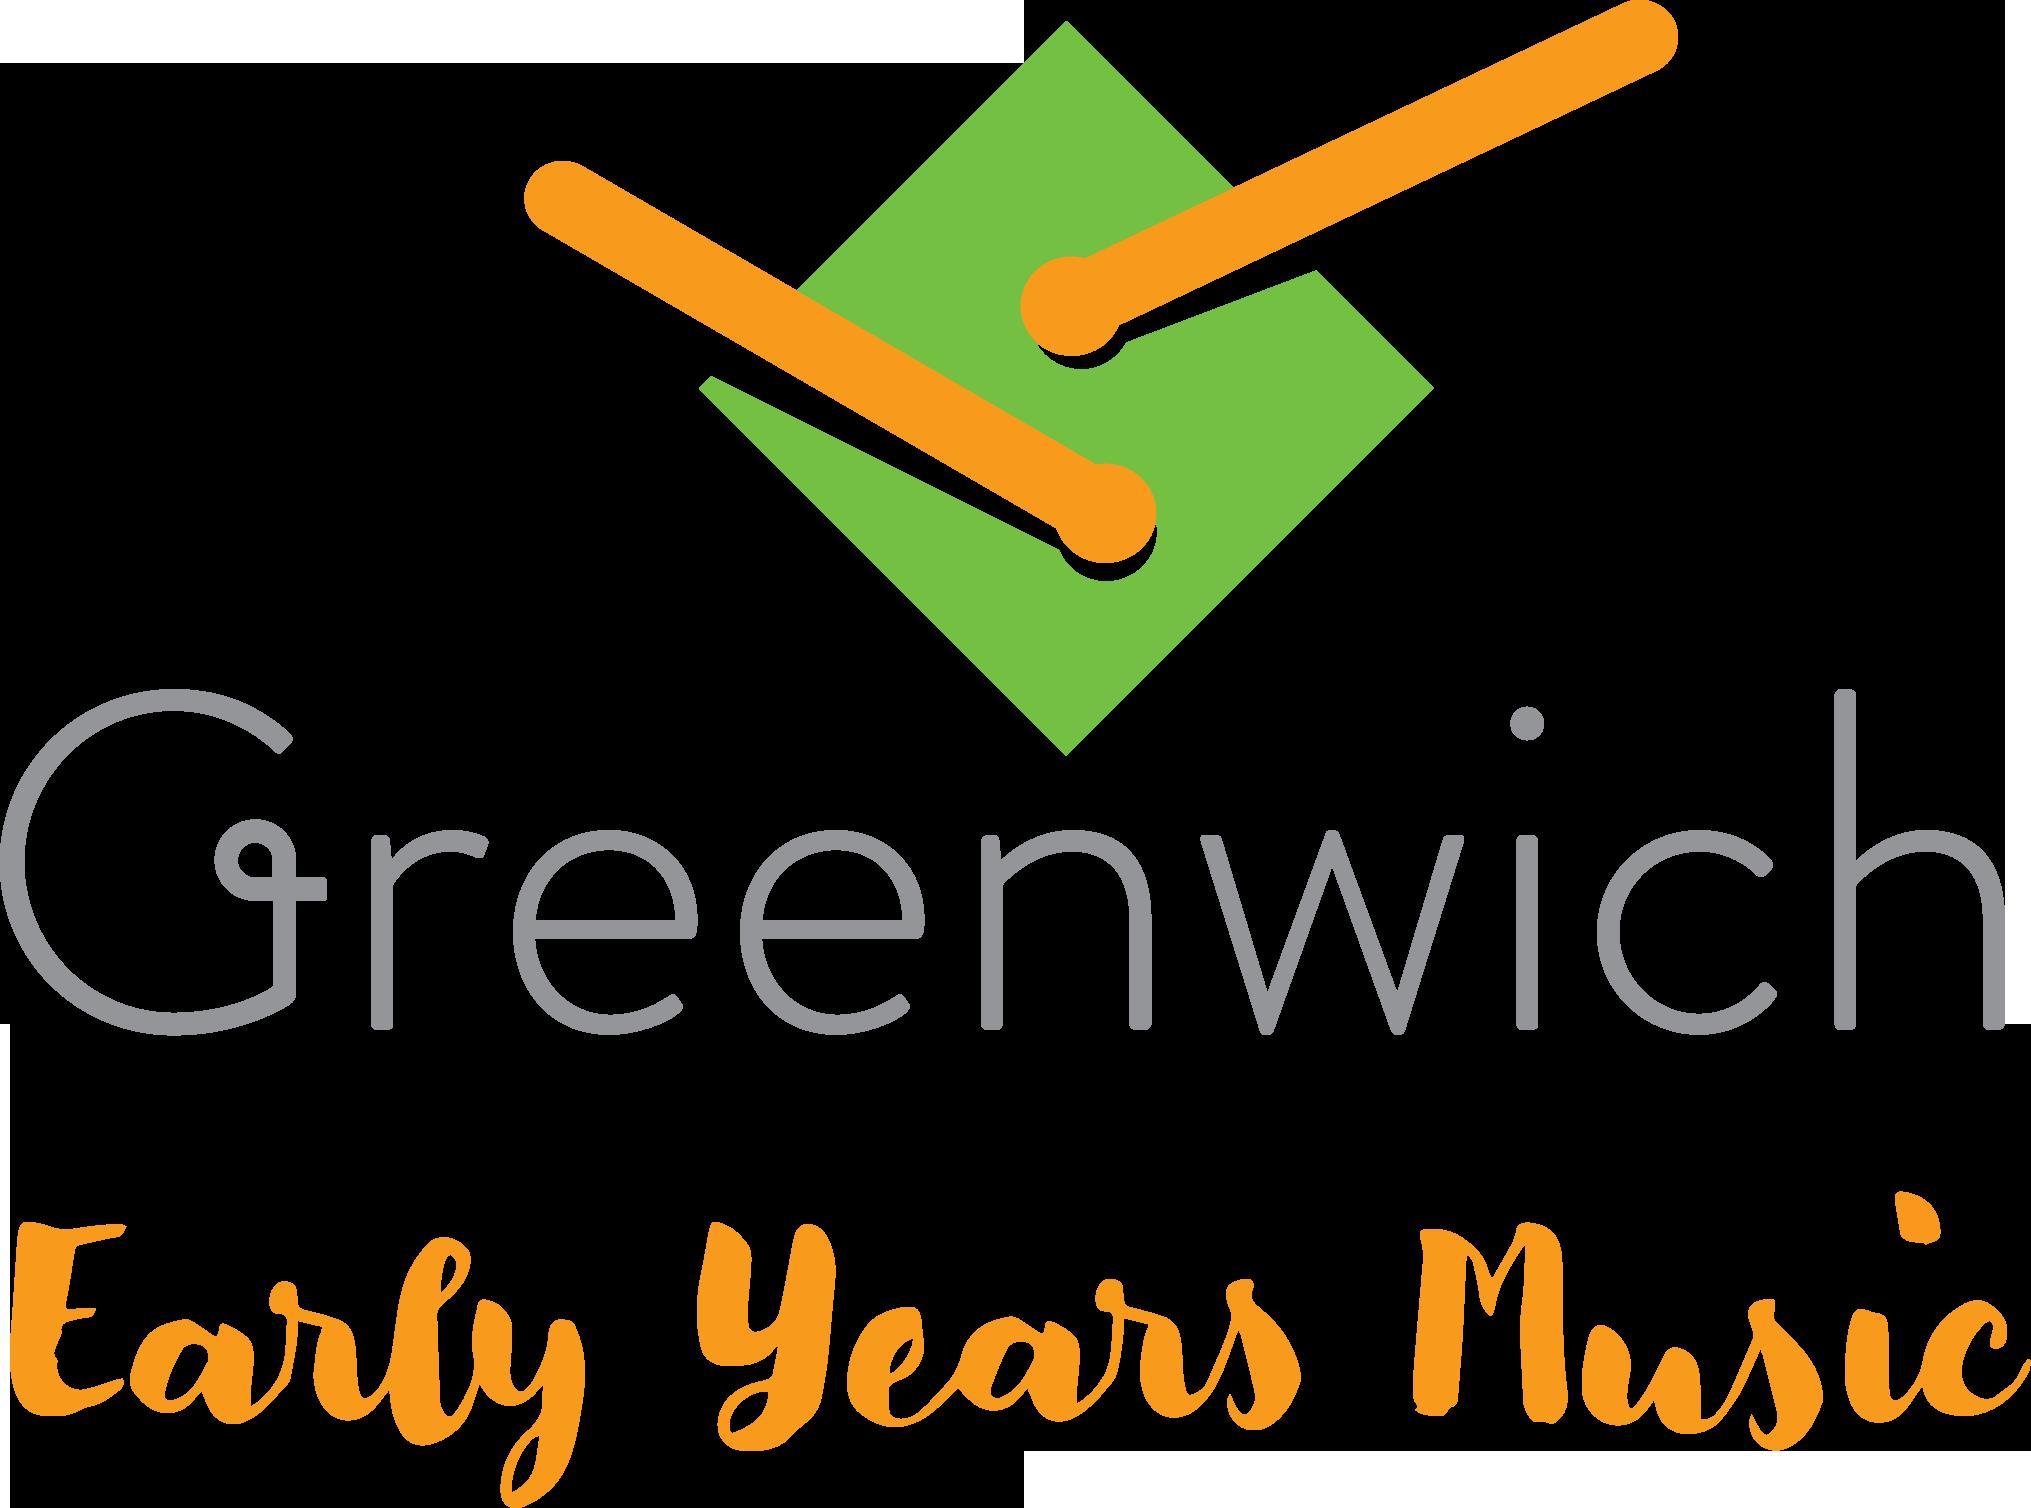 Greenwich Early Years Music